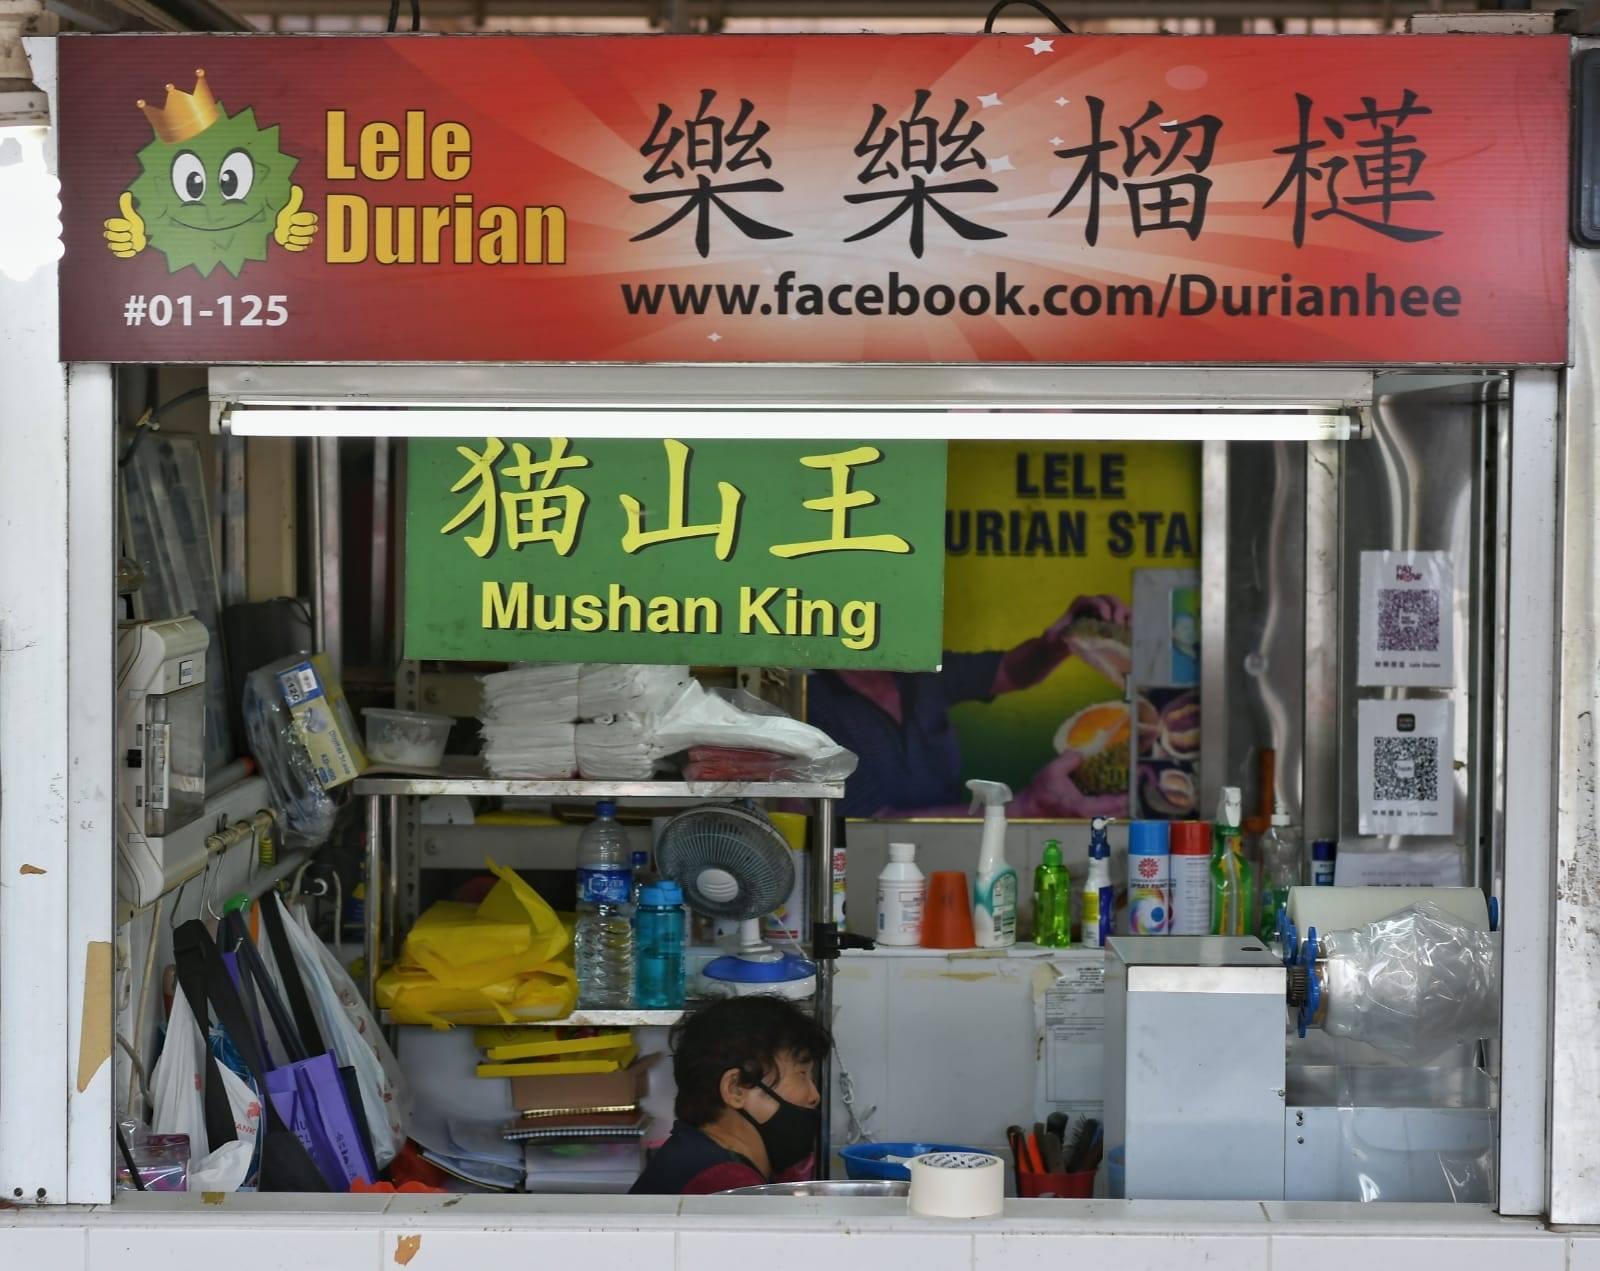 lele durian